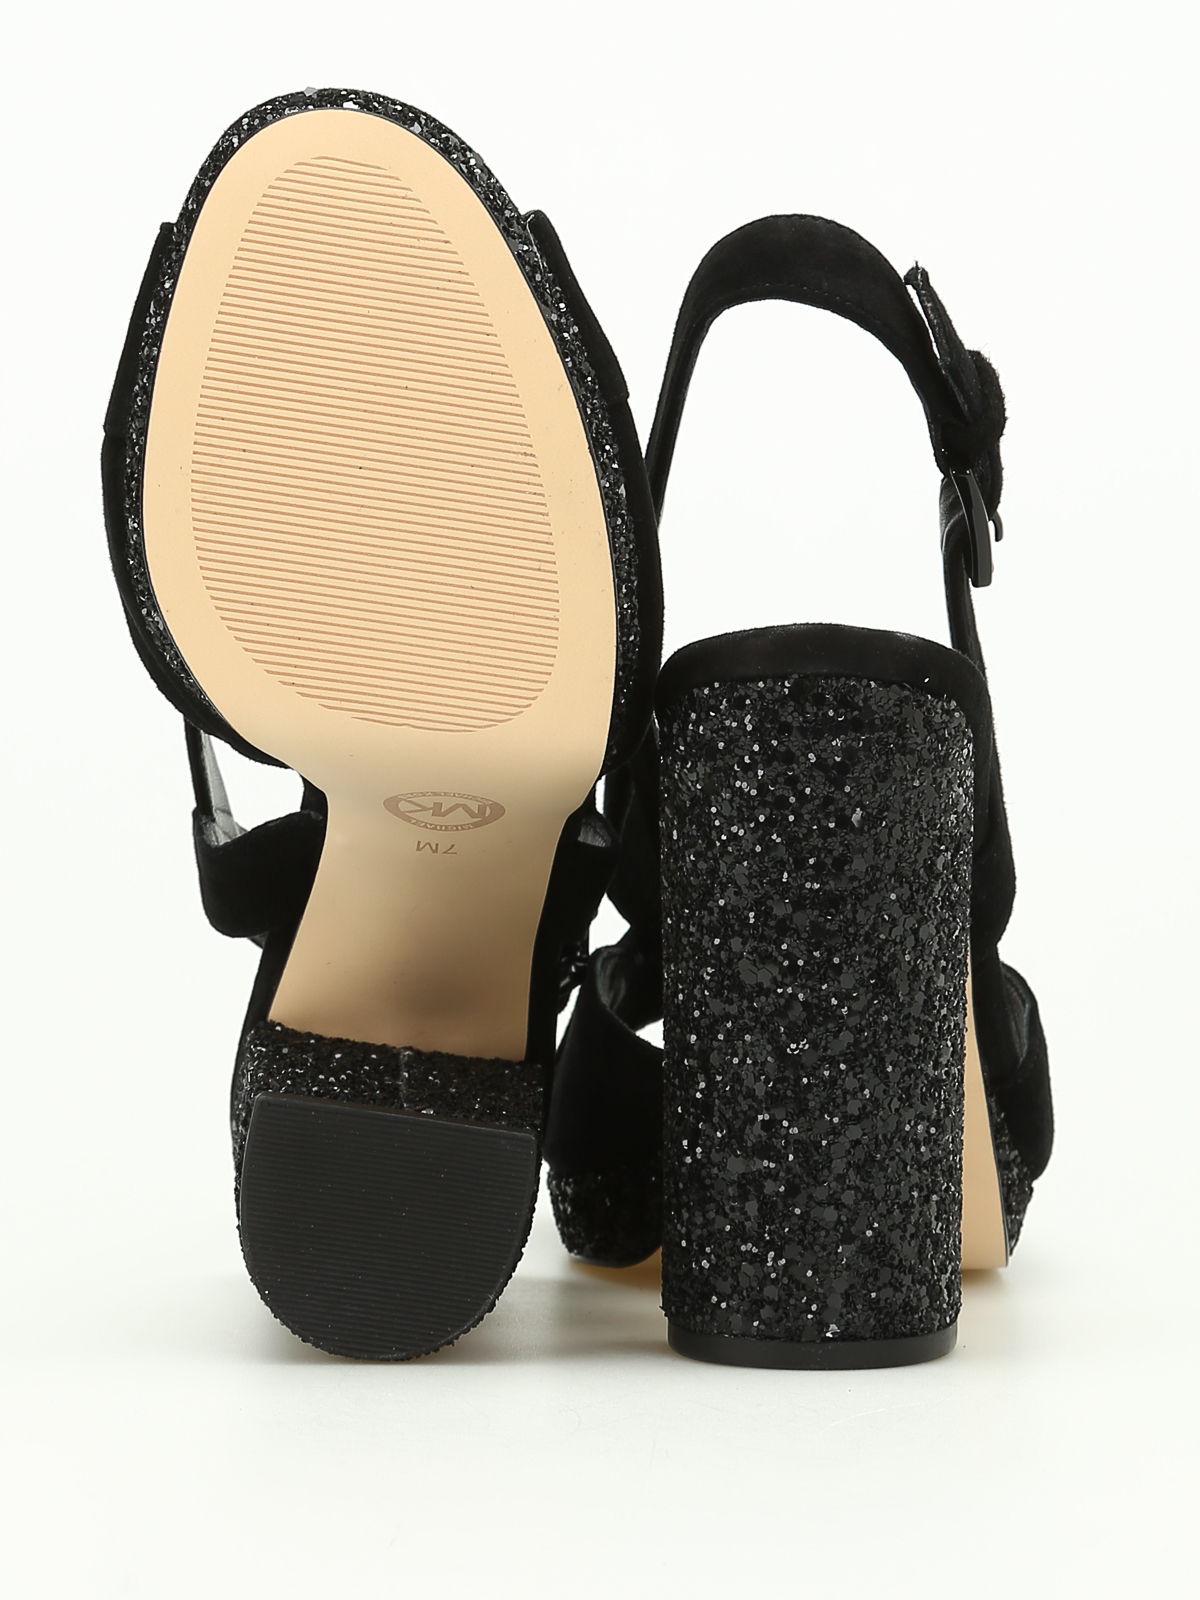 41ded1f8c17 Michael Kors - Becky platform sandals - sandals - 40F7BEHS4S001